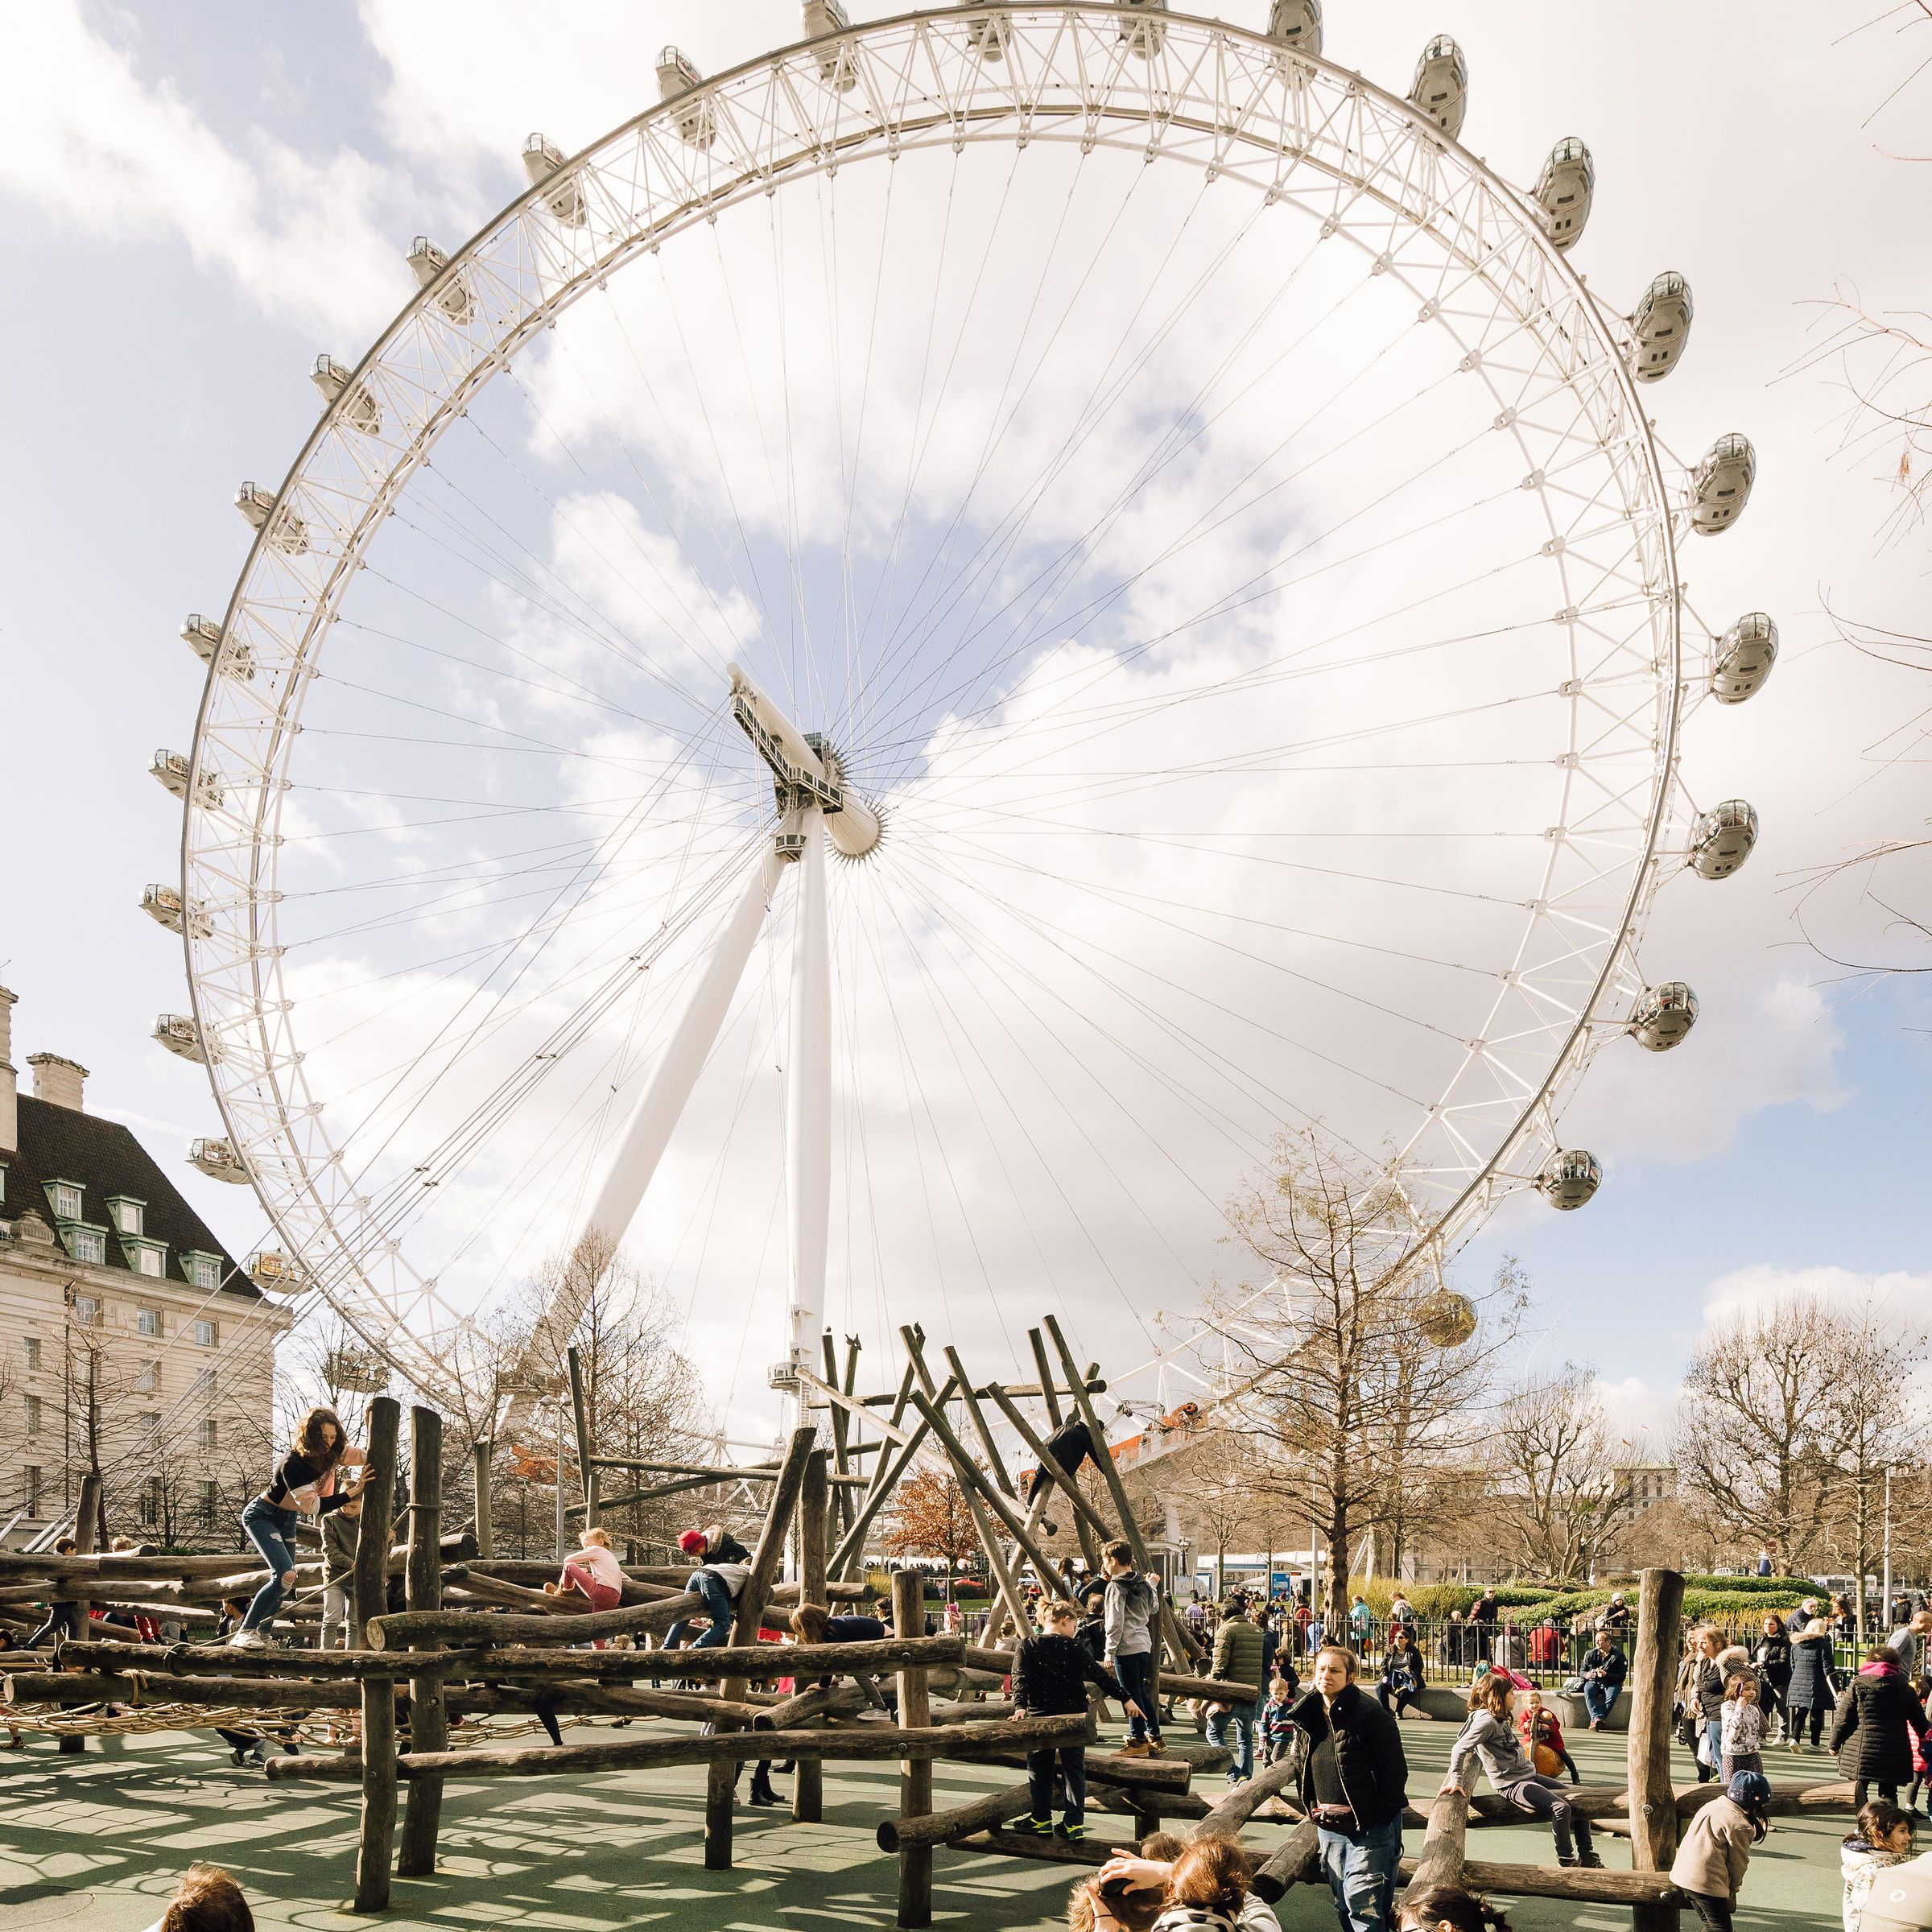 People under the London Eye